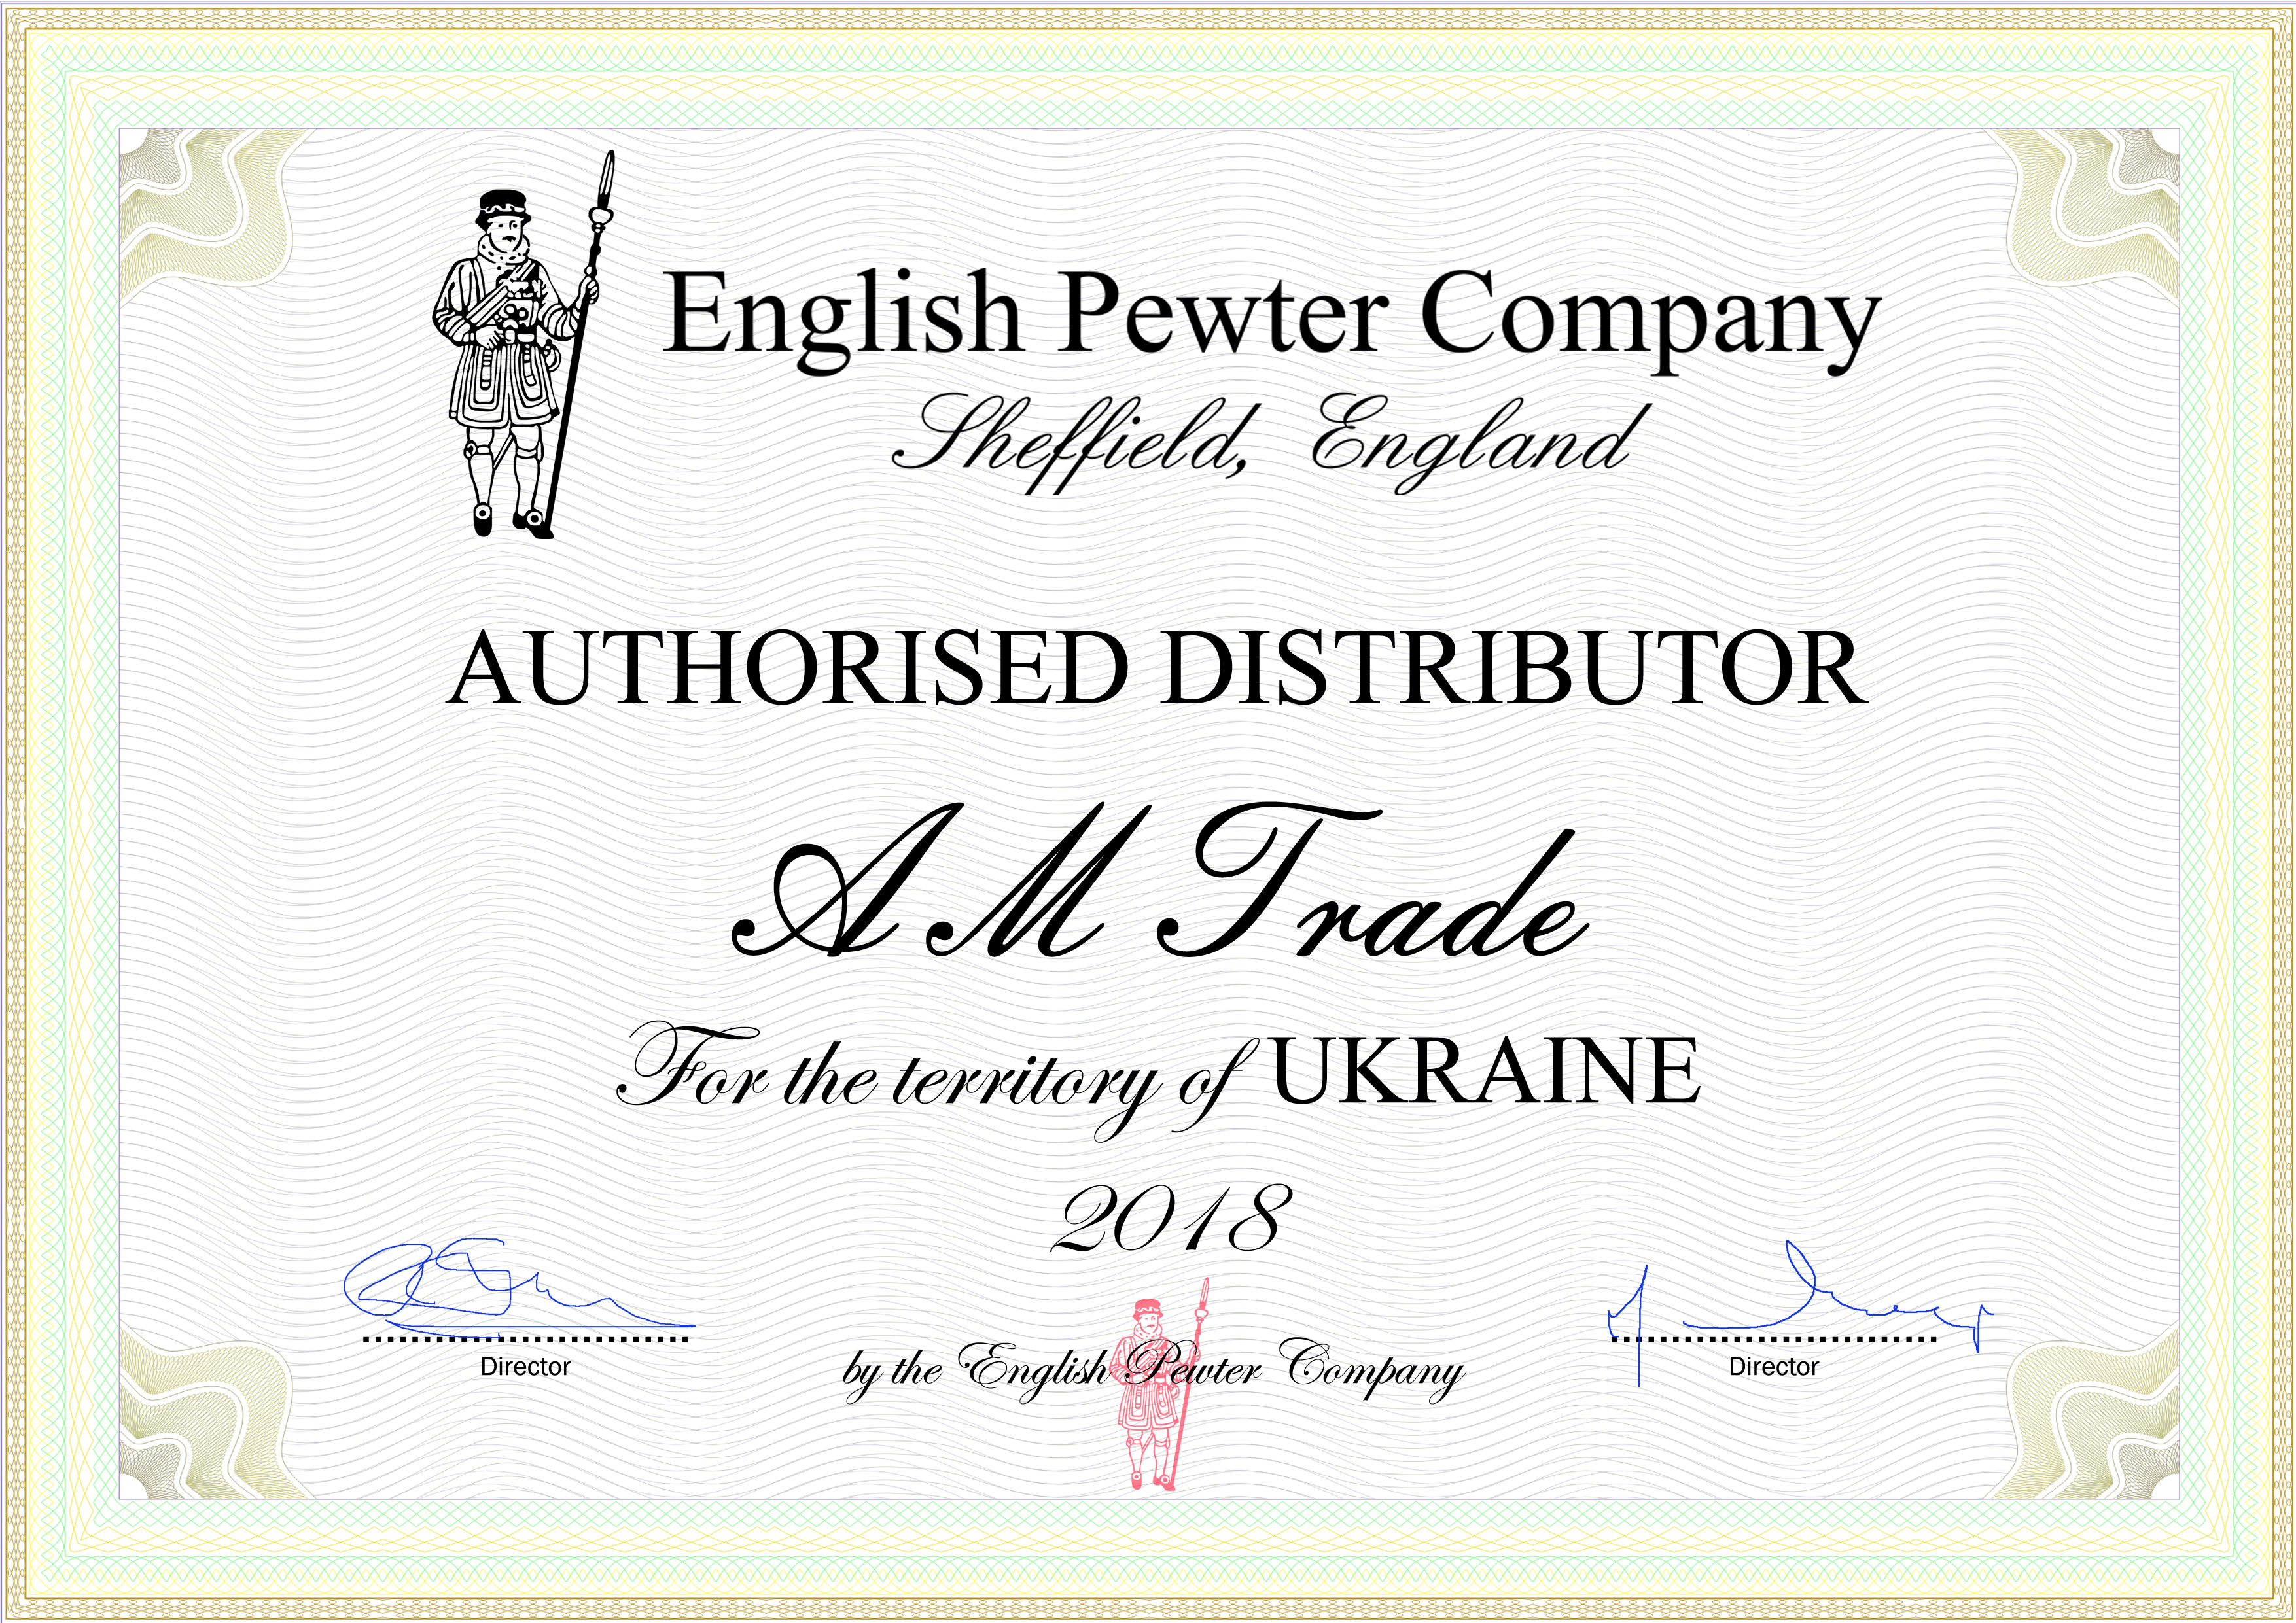 Сертификат дистрибьютора English Pewter в Украине